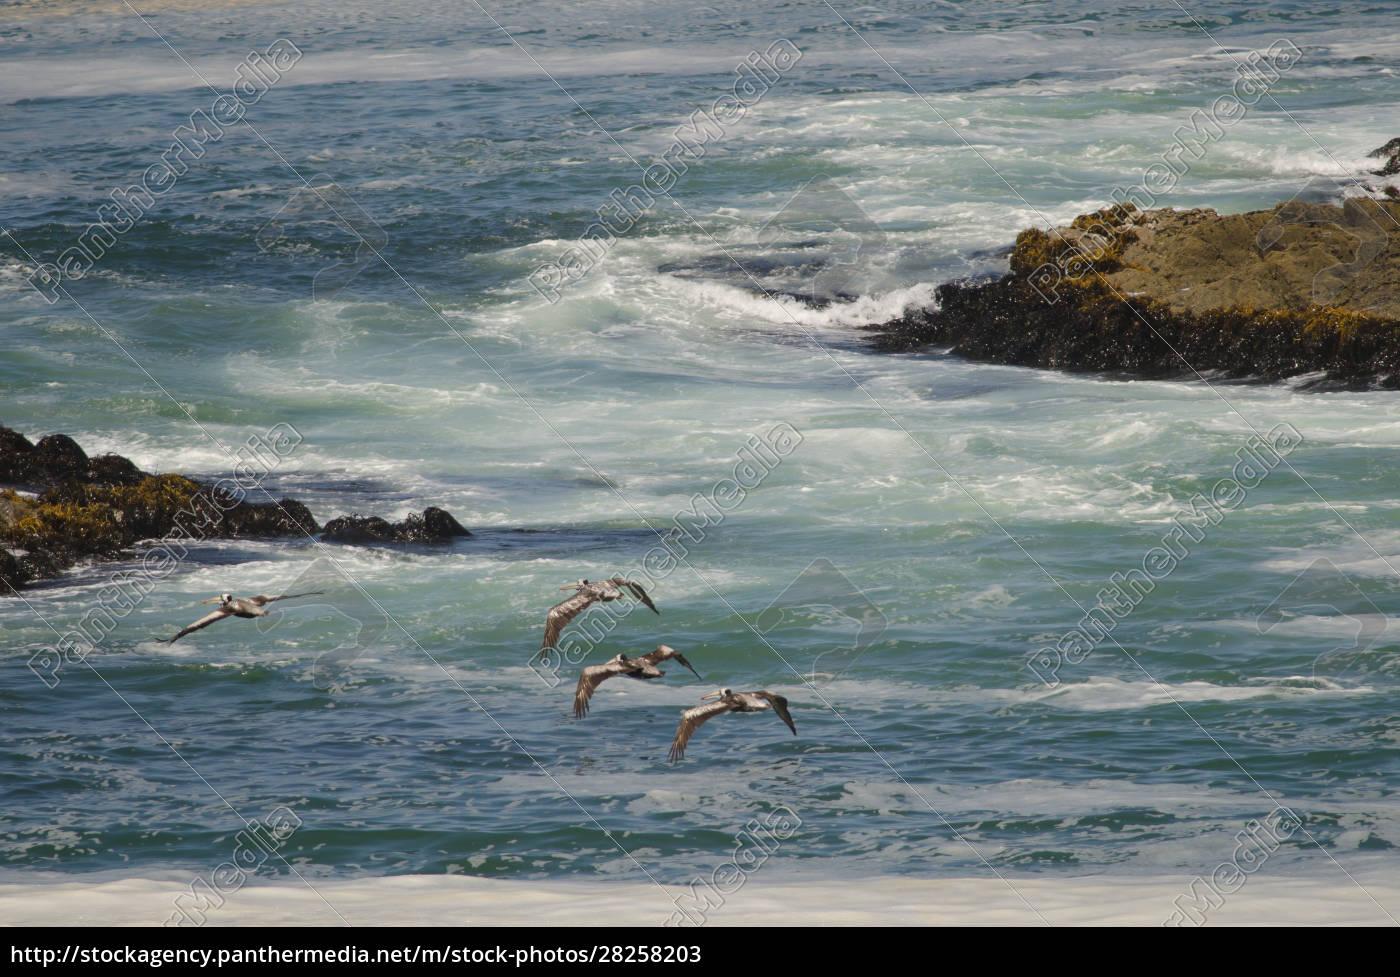 peruvian, pelicans, in, flight, over, the - 28258203